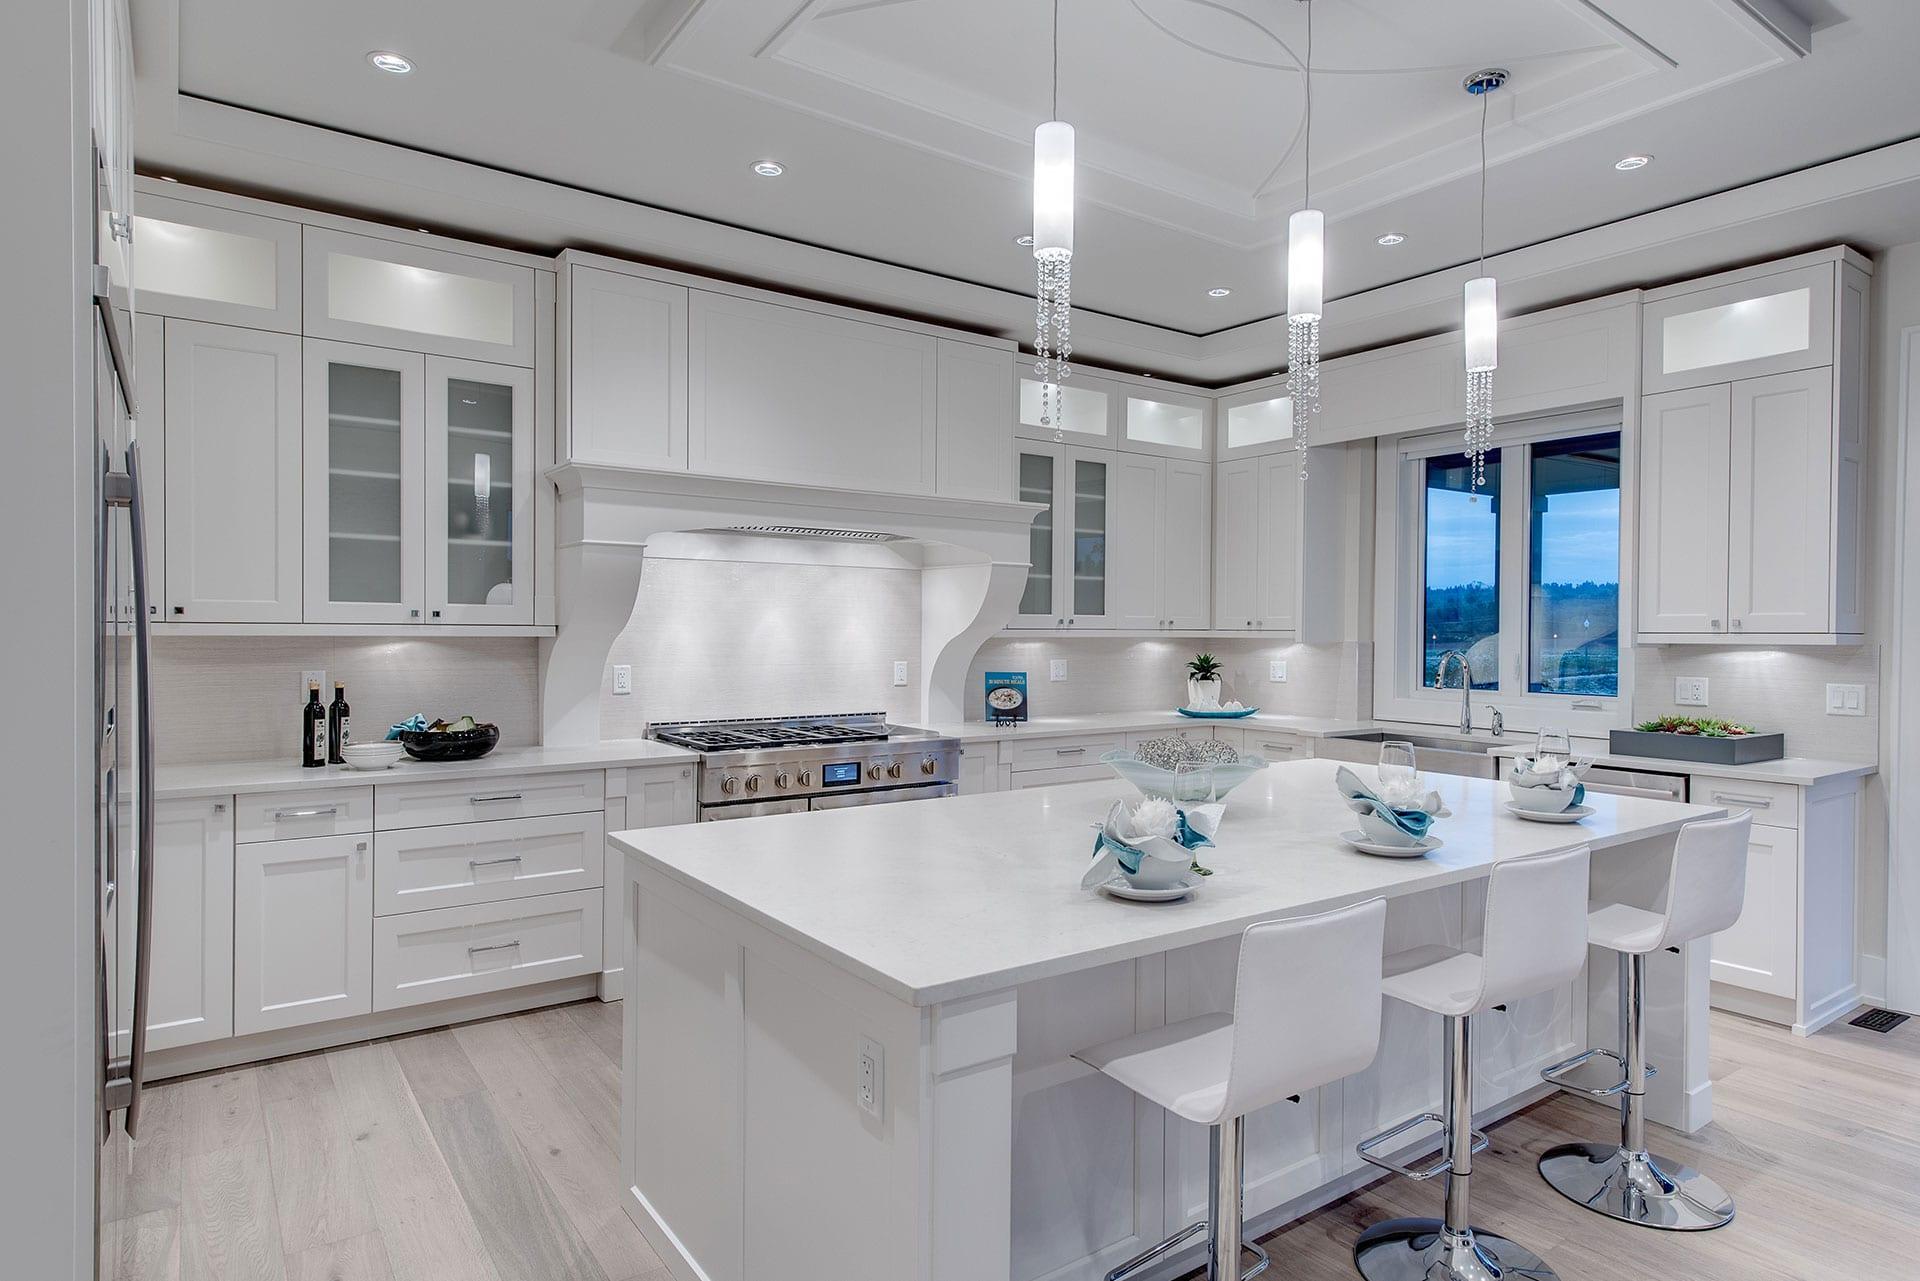 transitional kitchen cabinets designs  styles  sunrise